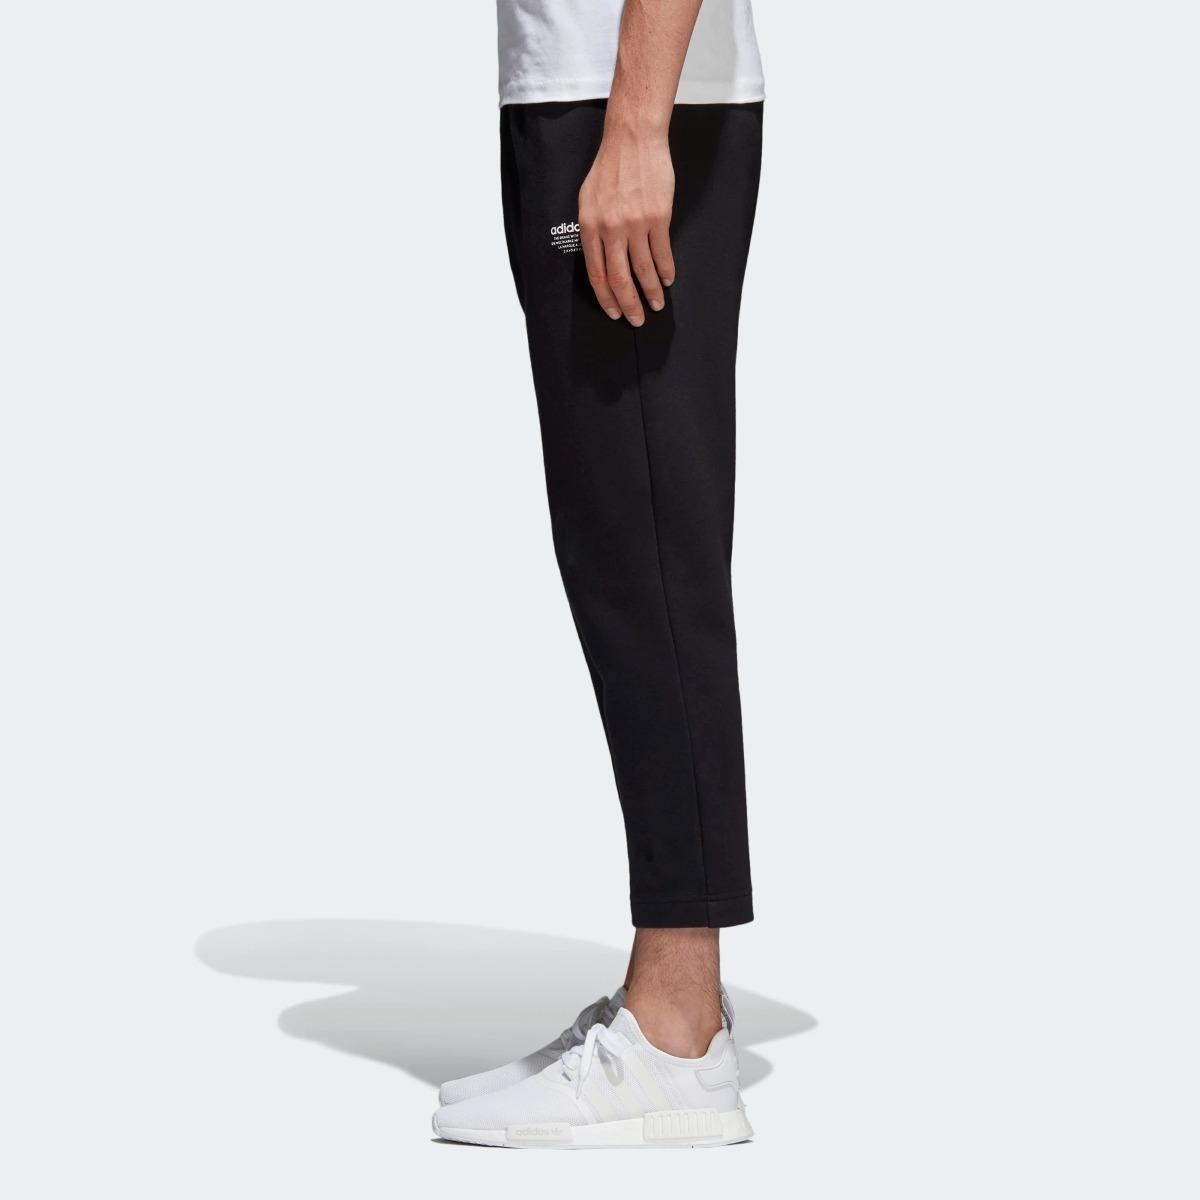 d69ea71d2 Calça adidas Masculina Nmd Sweat Moleton Preta - R$ 169,99 em ...